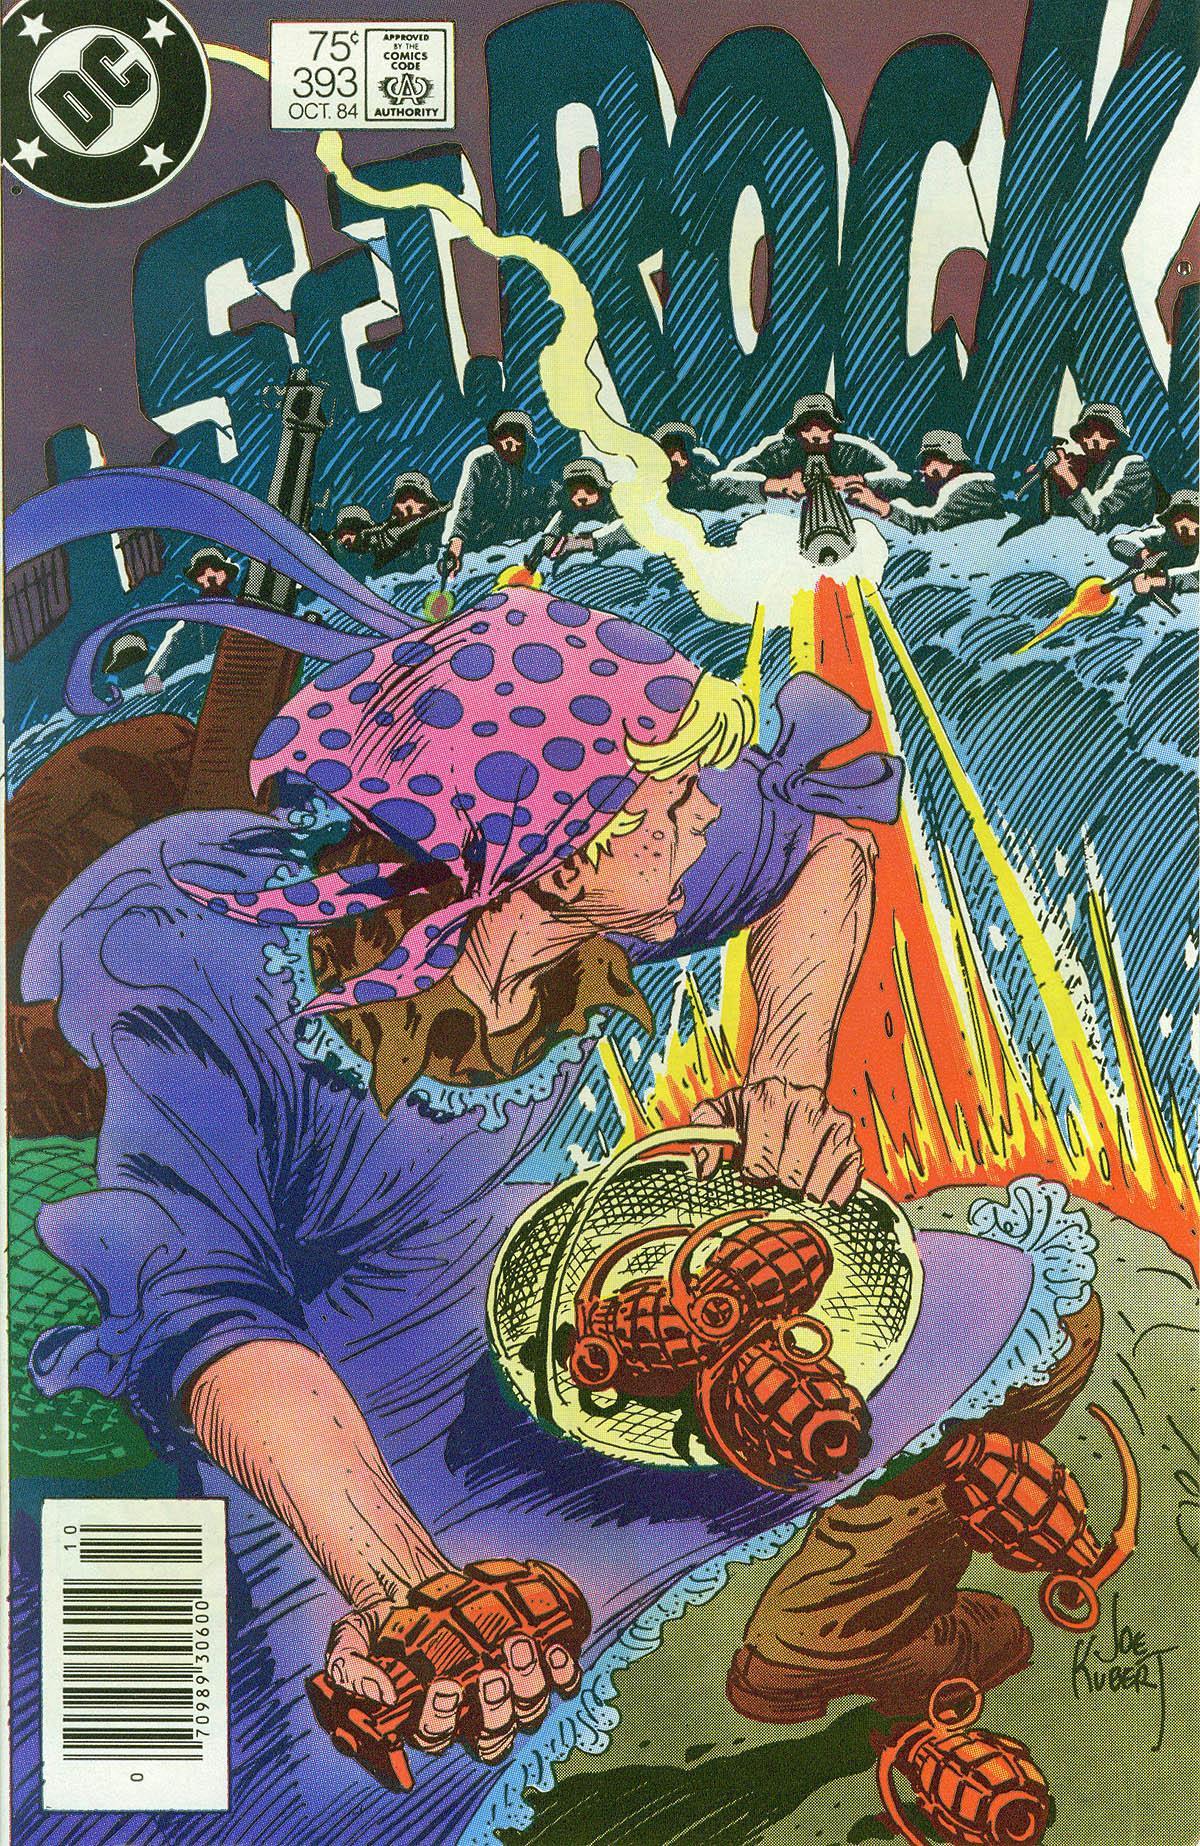 Read online Sgt. Rock comic -  Issue #393 - 1